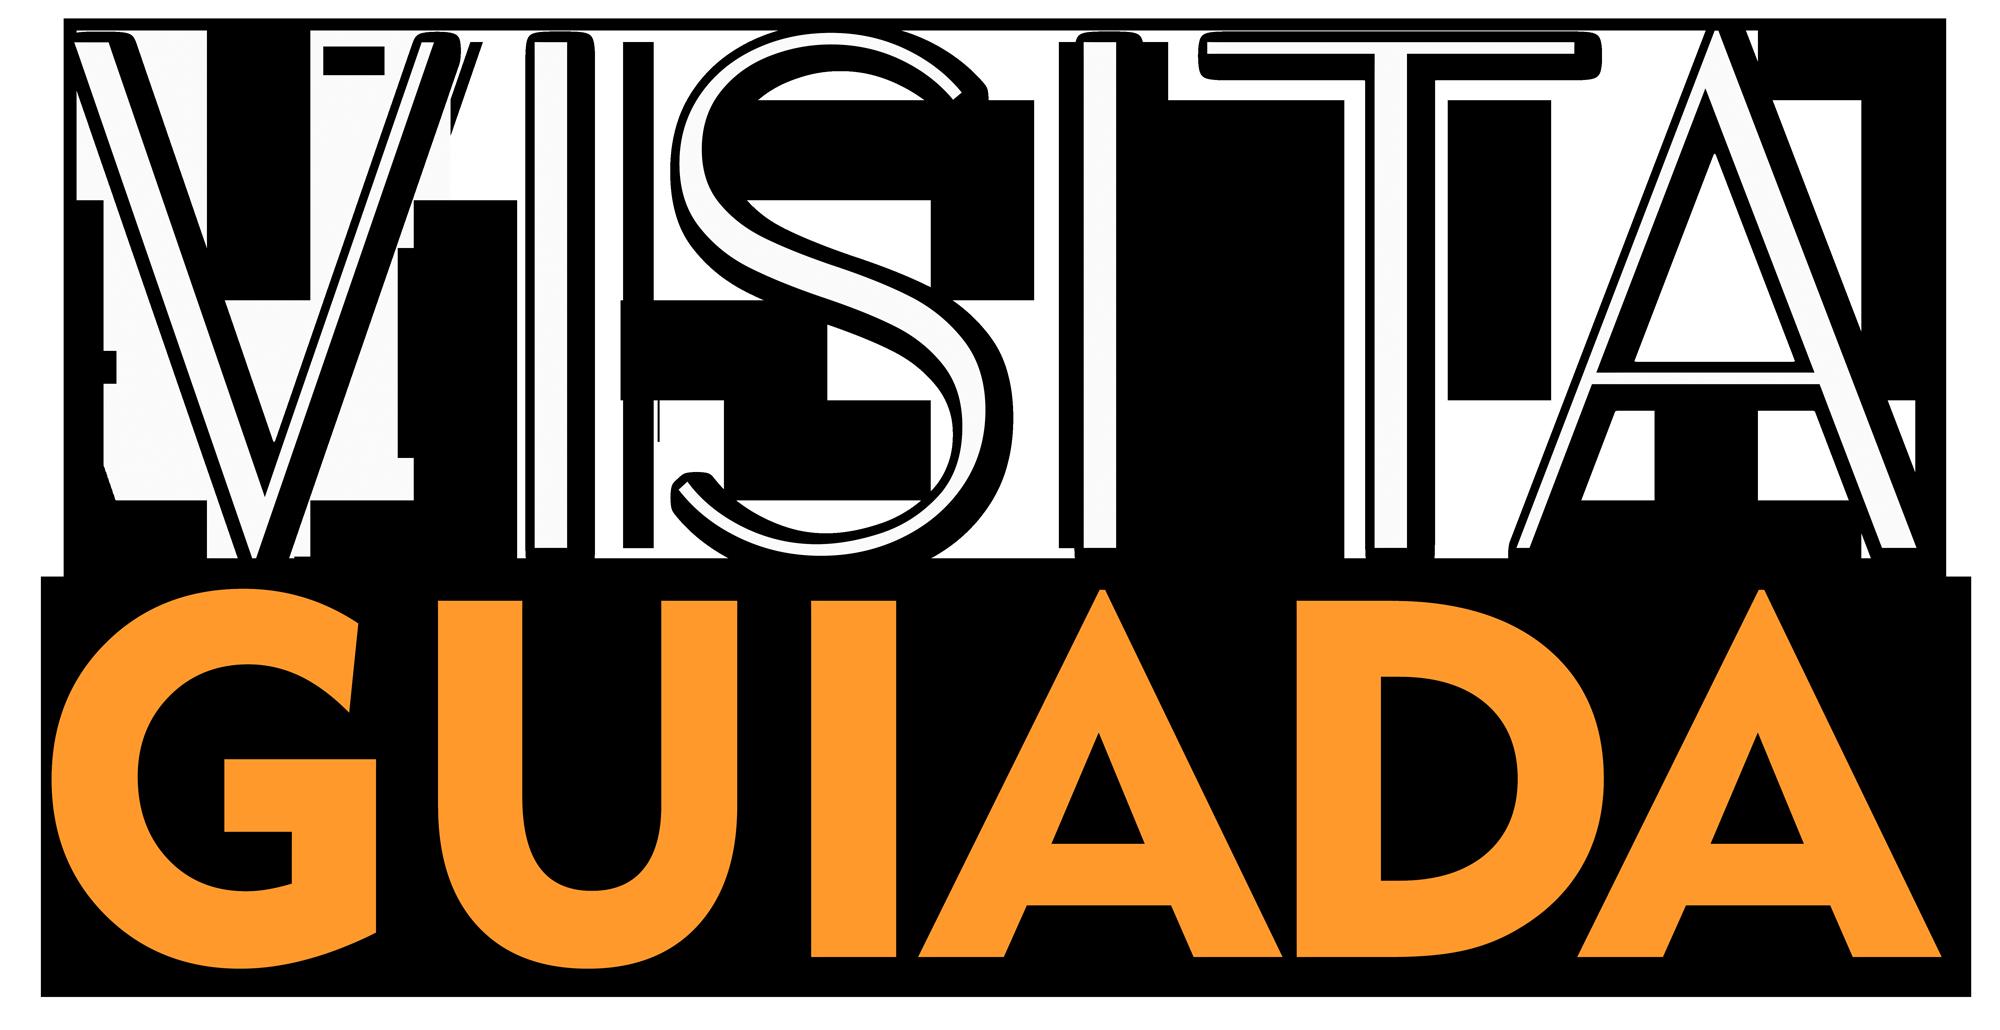 Logótipo Visita Guiada